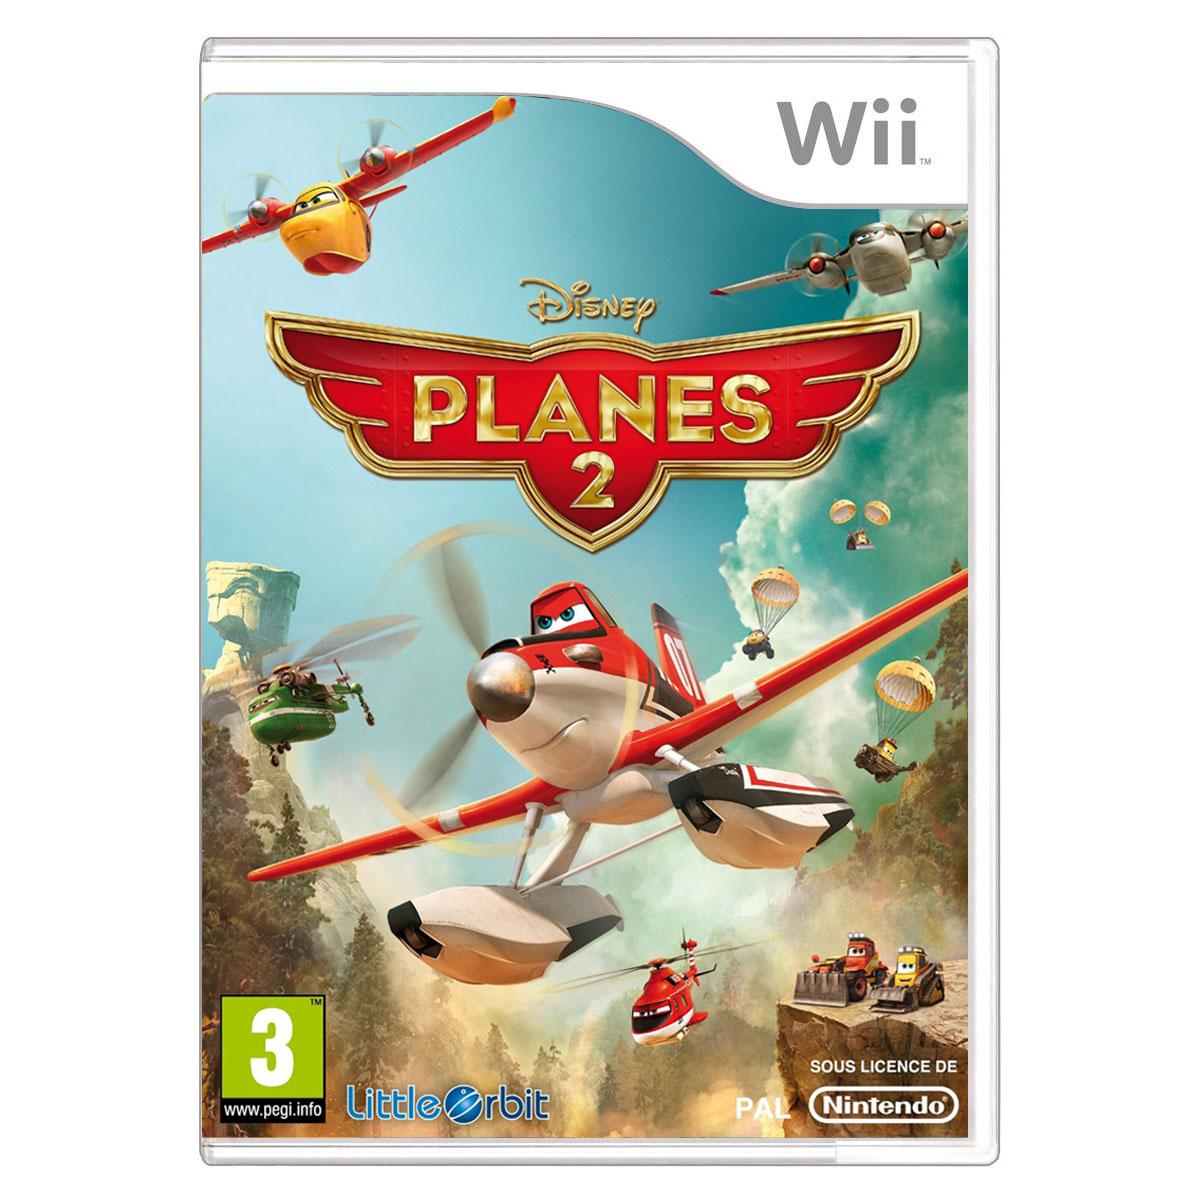 LDLC.com Planes 2 (Wii)  Planes 2 (Wii)